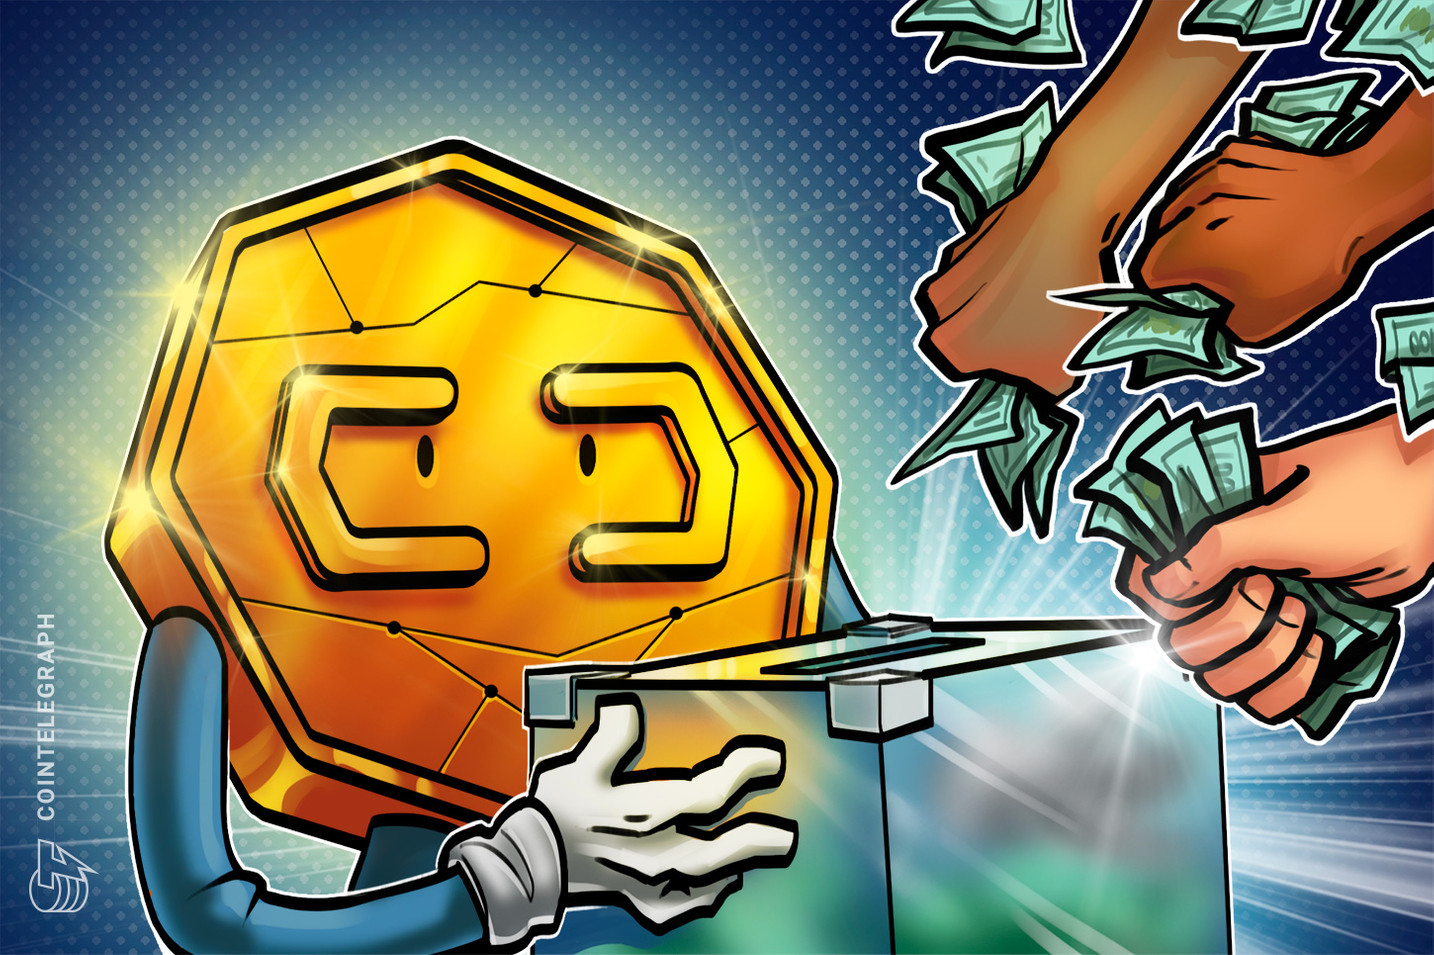 Polkadot Web3 wallet Talisman closes $2.35M seed funding round